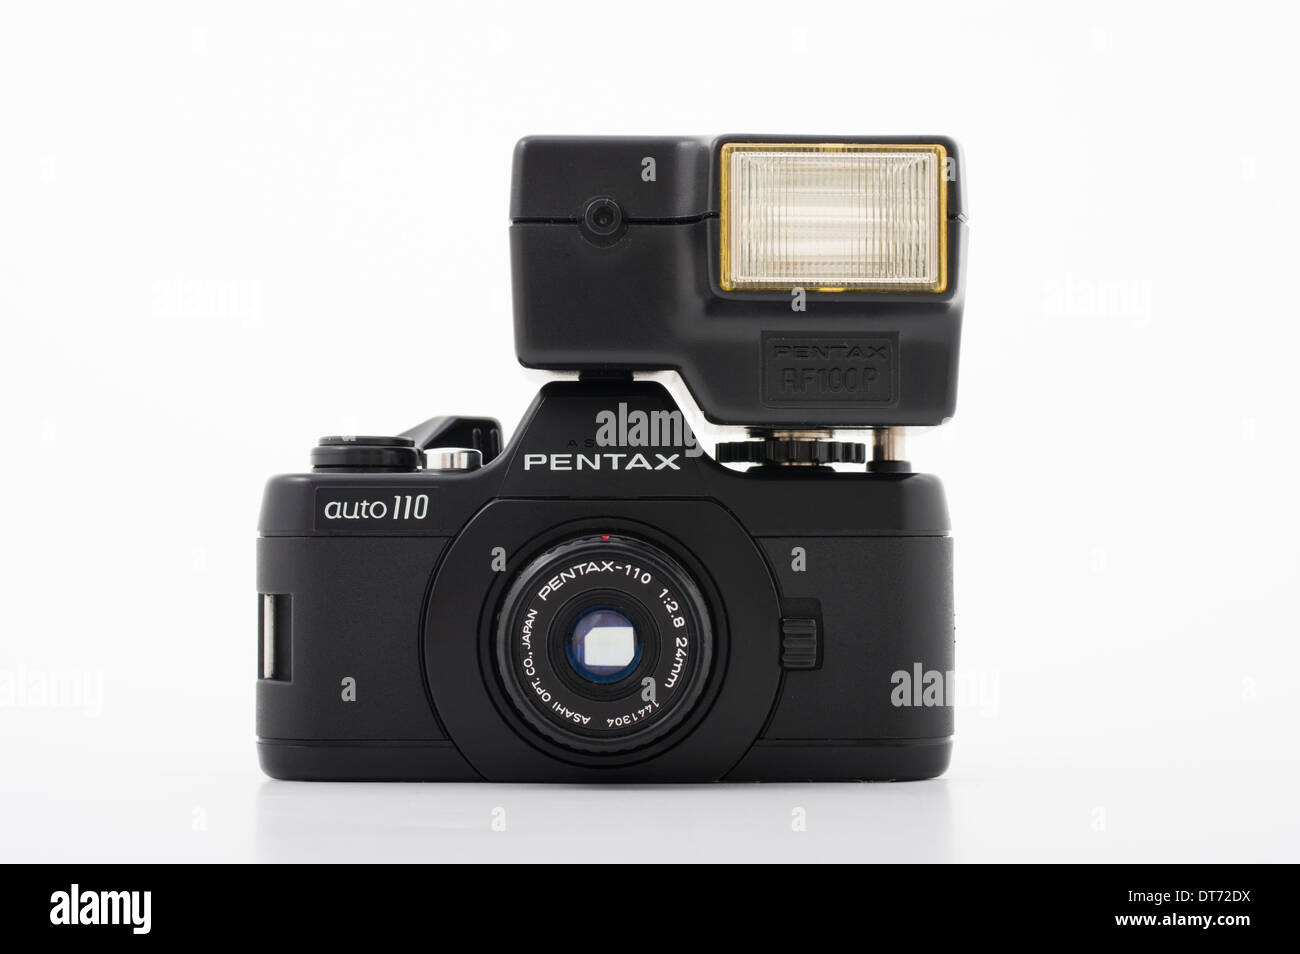 Pentax auto 110 cámara SLR de película mediante Compact 110 film Foto de stock